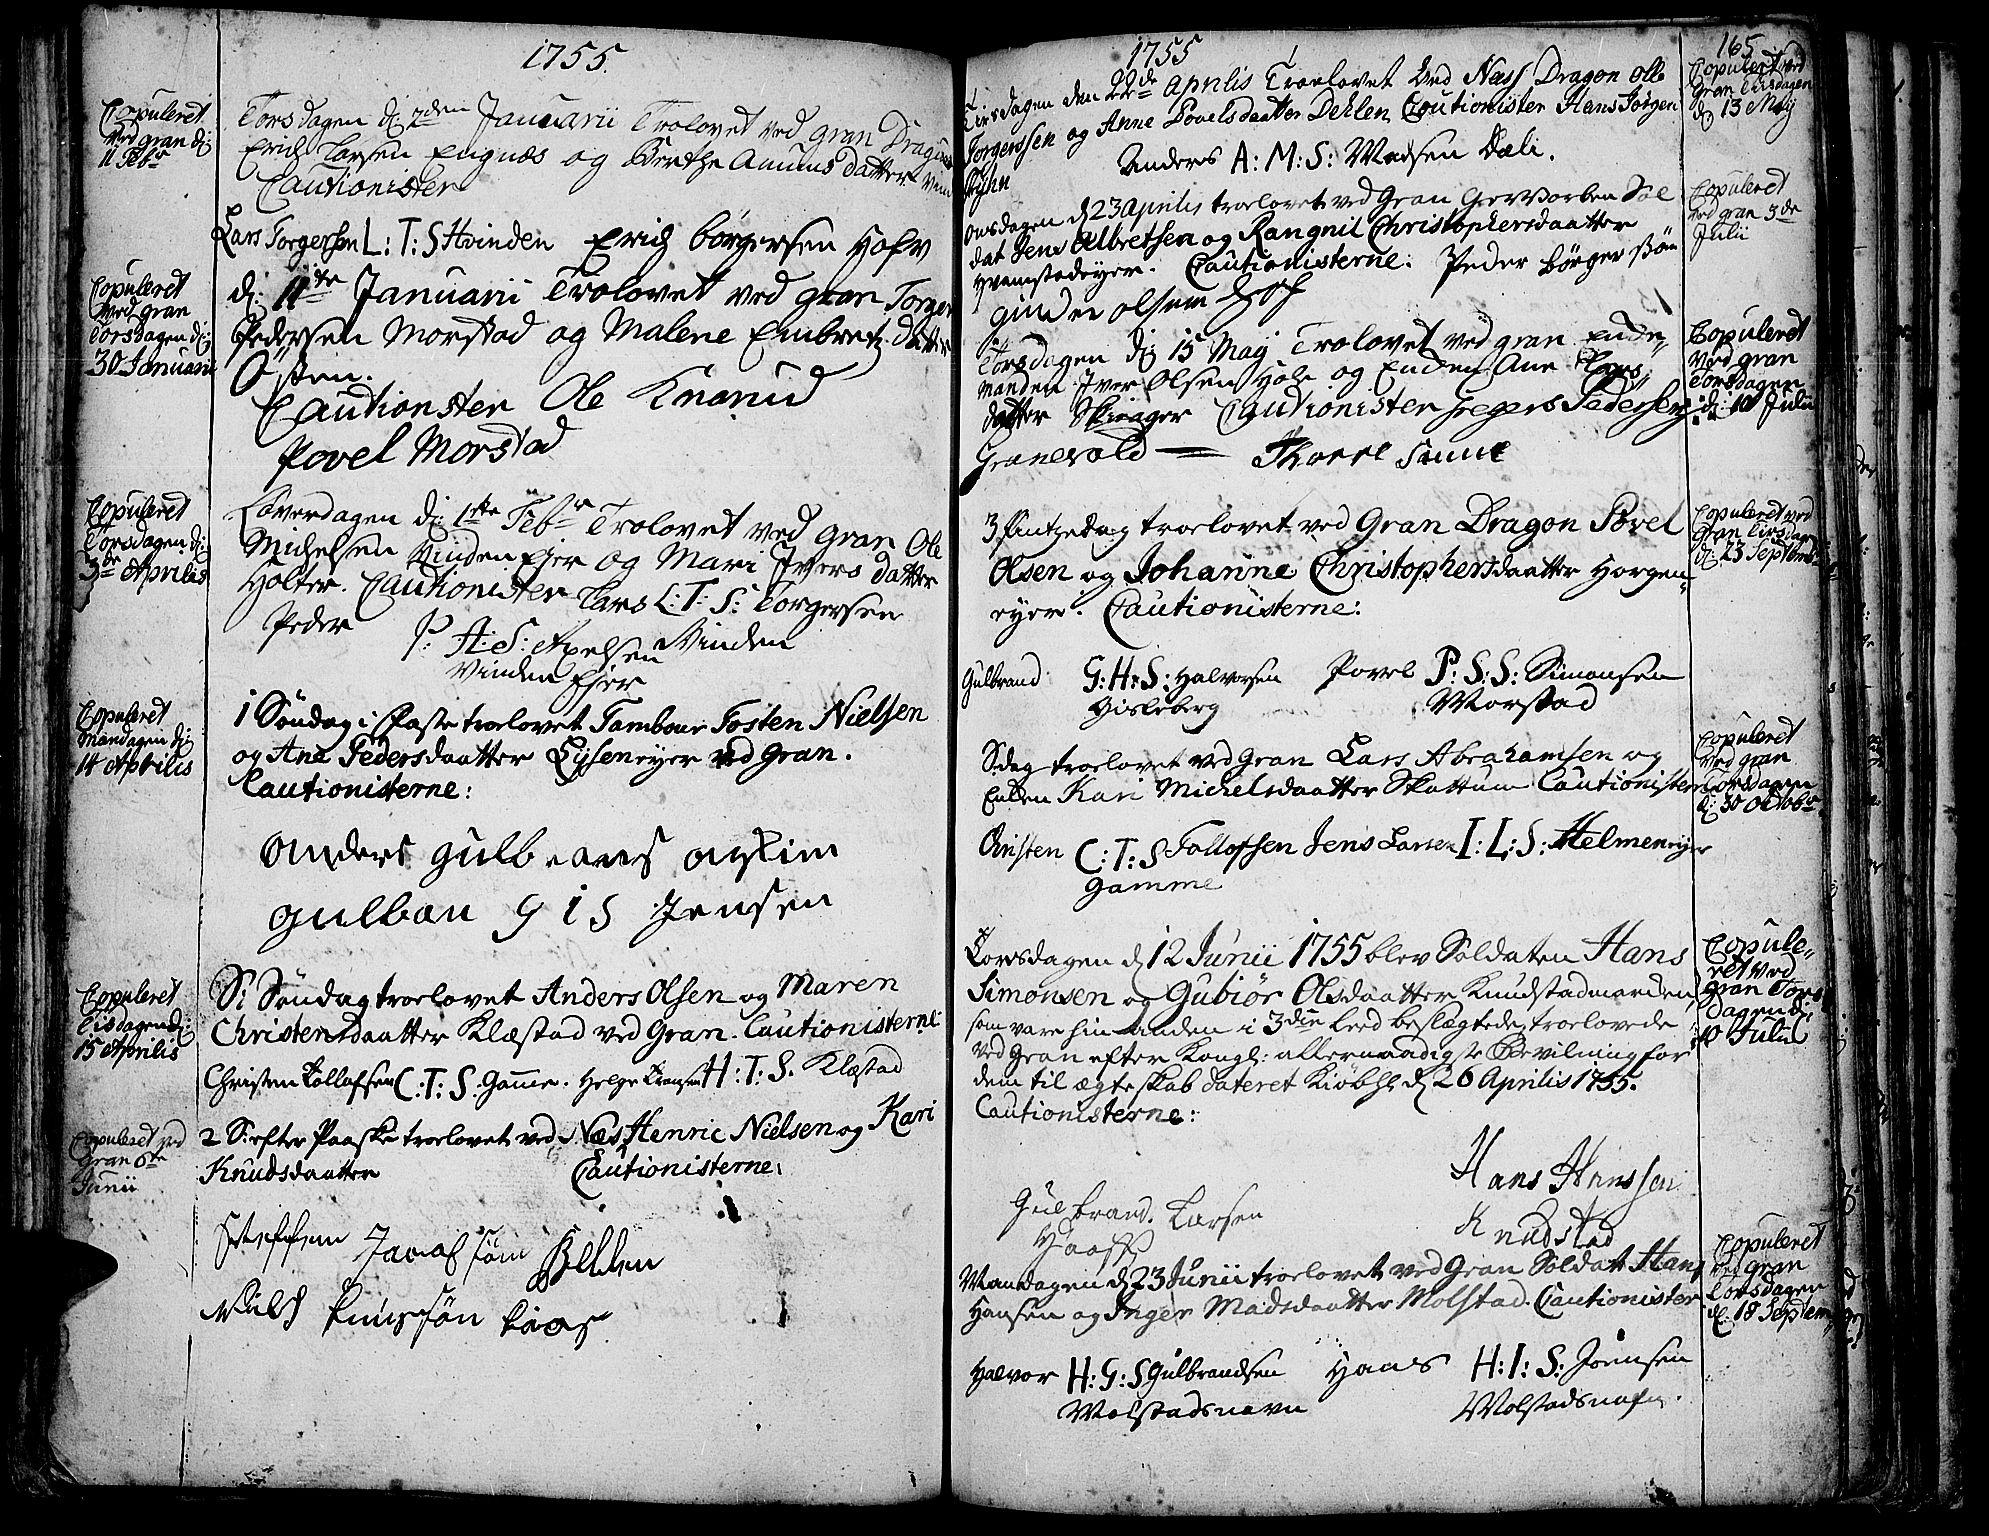 SAH, Gran prestekontor, Ministerialbok nr. 3, 1745-1758, s. 165